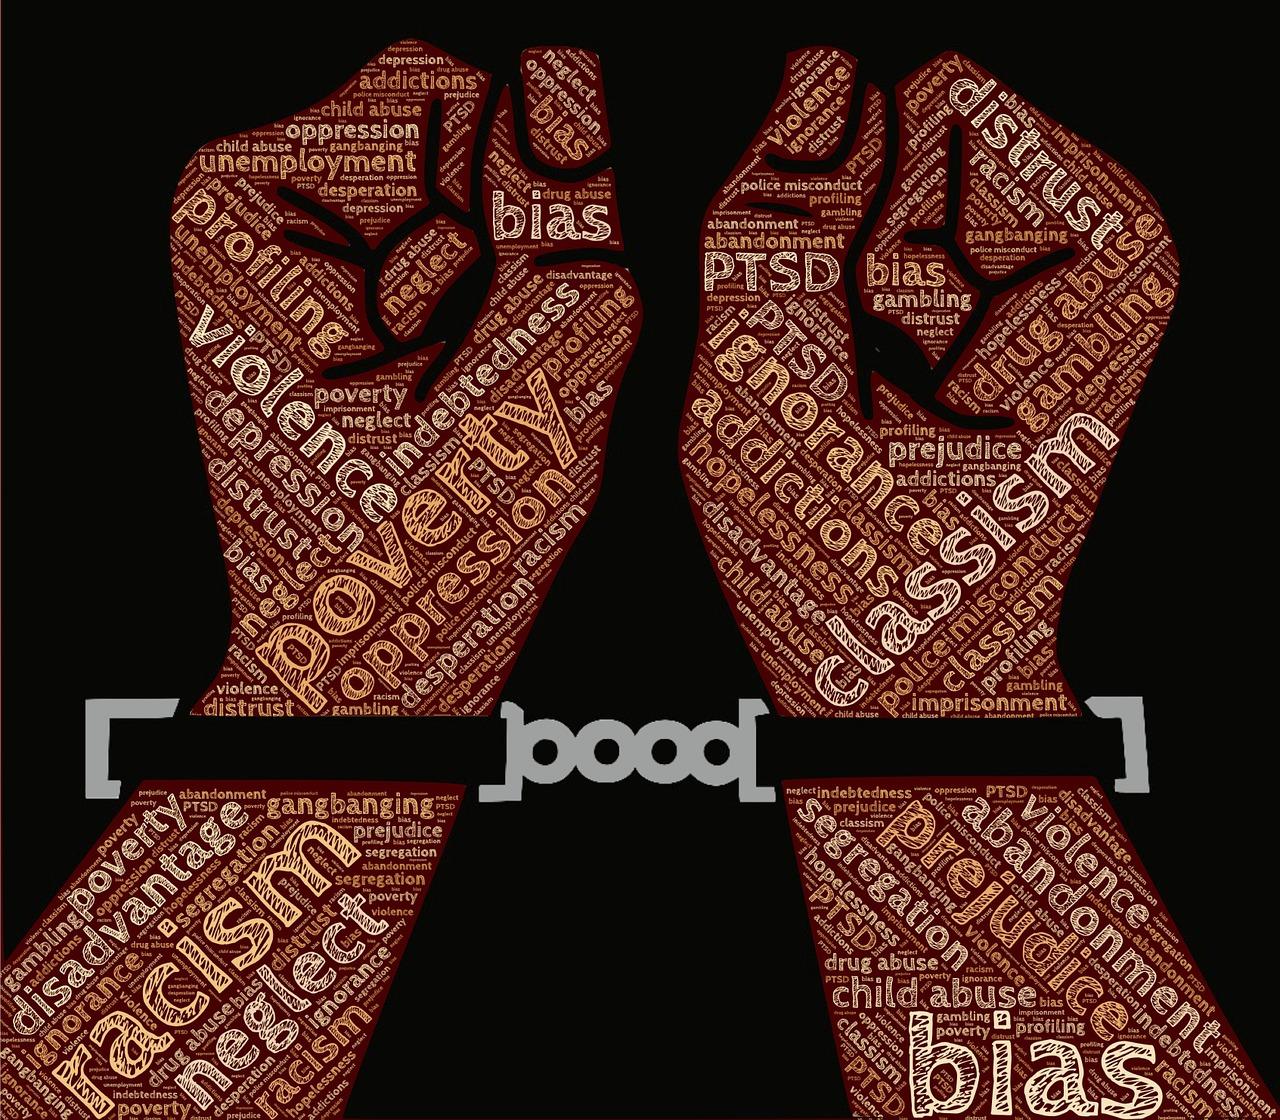 sentencing bias